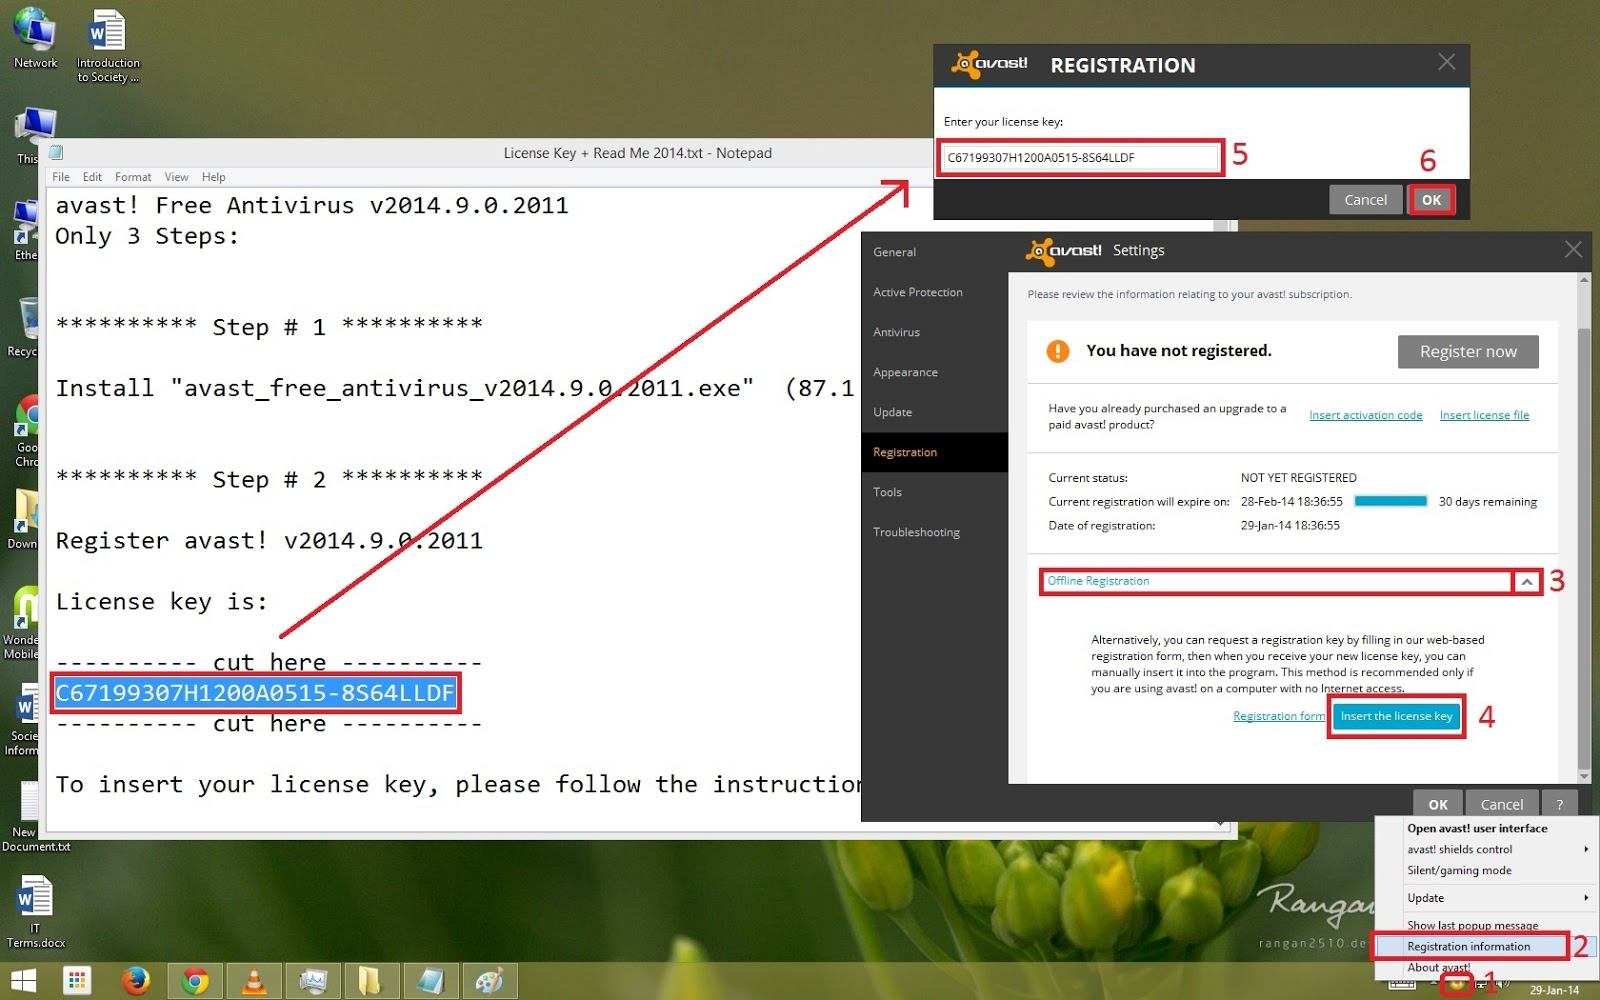 avast free antivirus offline registration license key